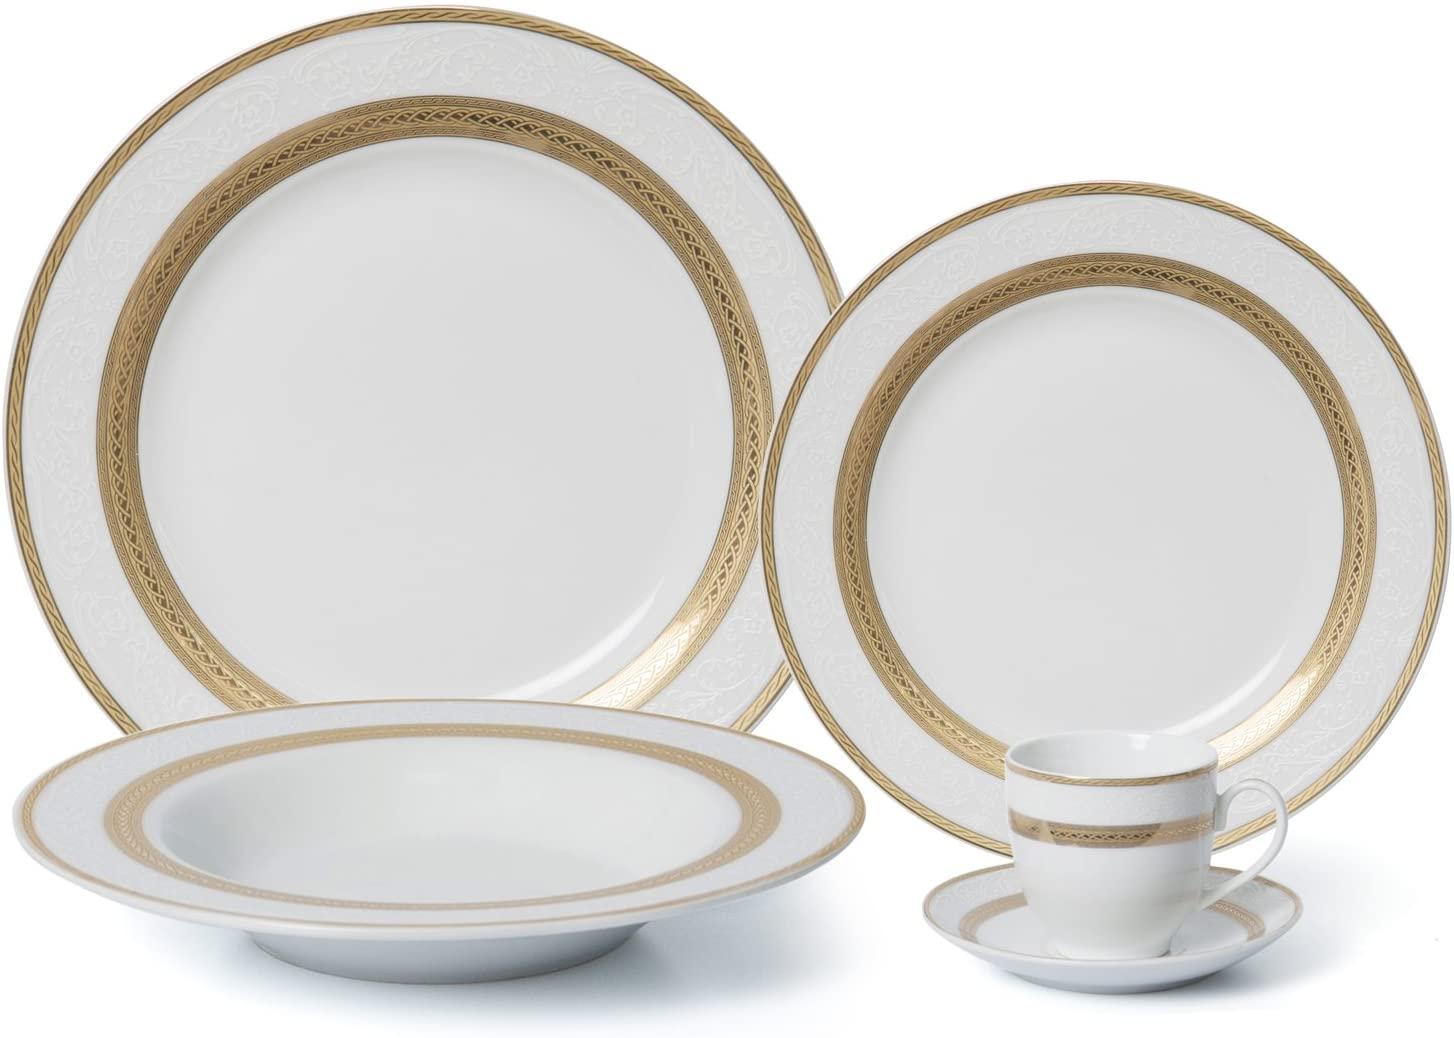 Royalty Porcelain 5-pc Dinner Set for 1, 24K Gold, Premium Bone China Porcelain (G093-5)